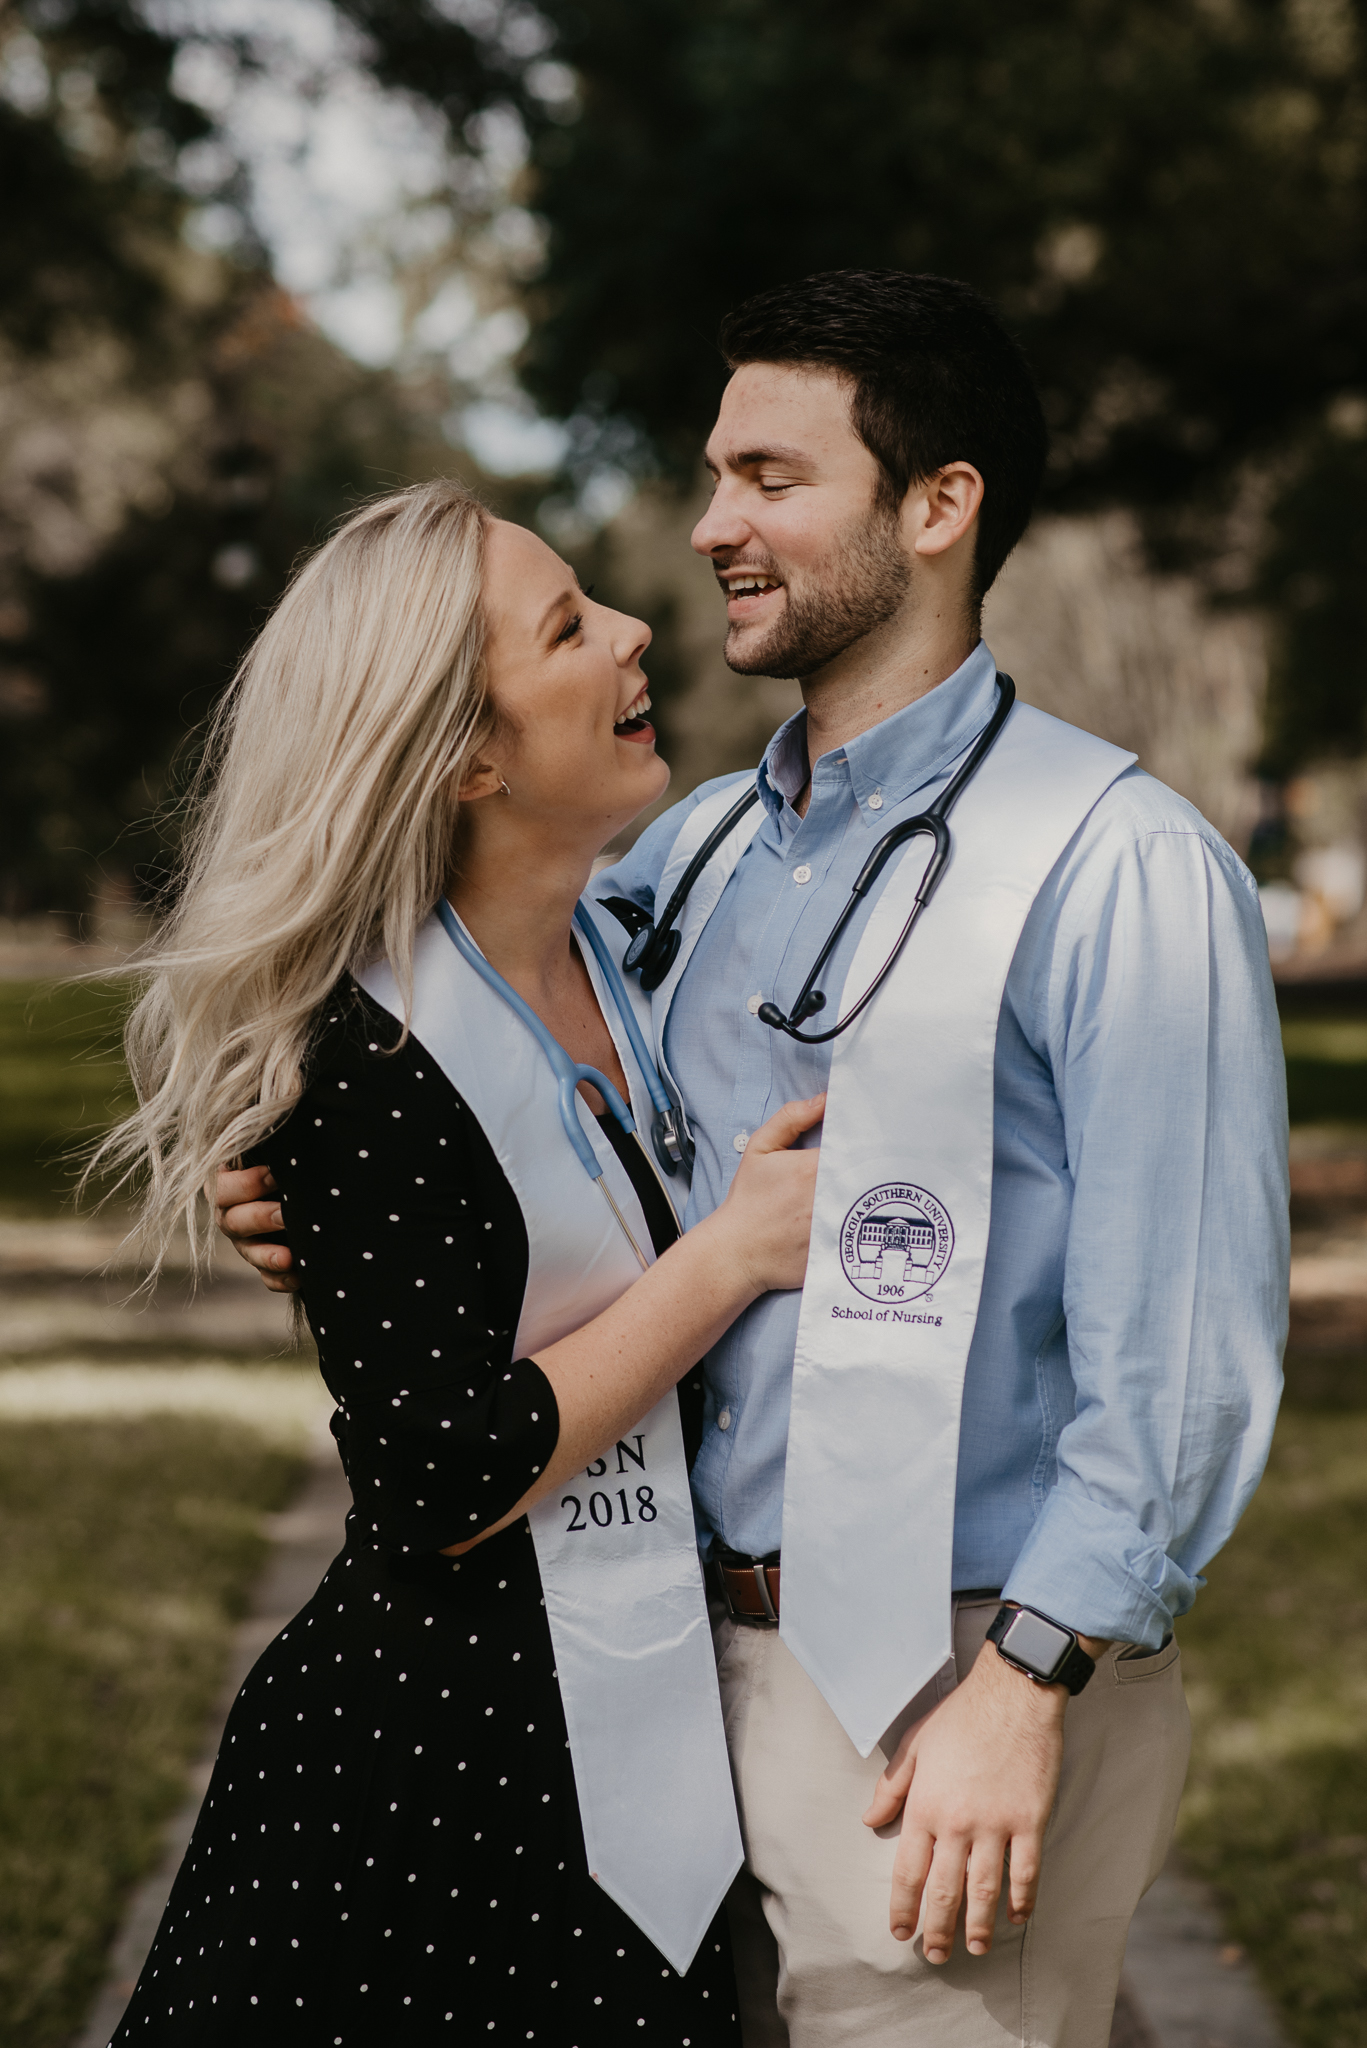 Graduation-57.jpg